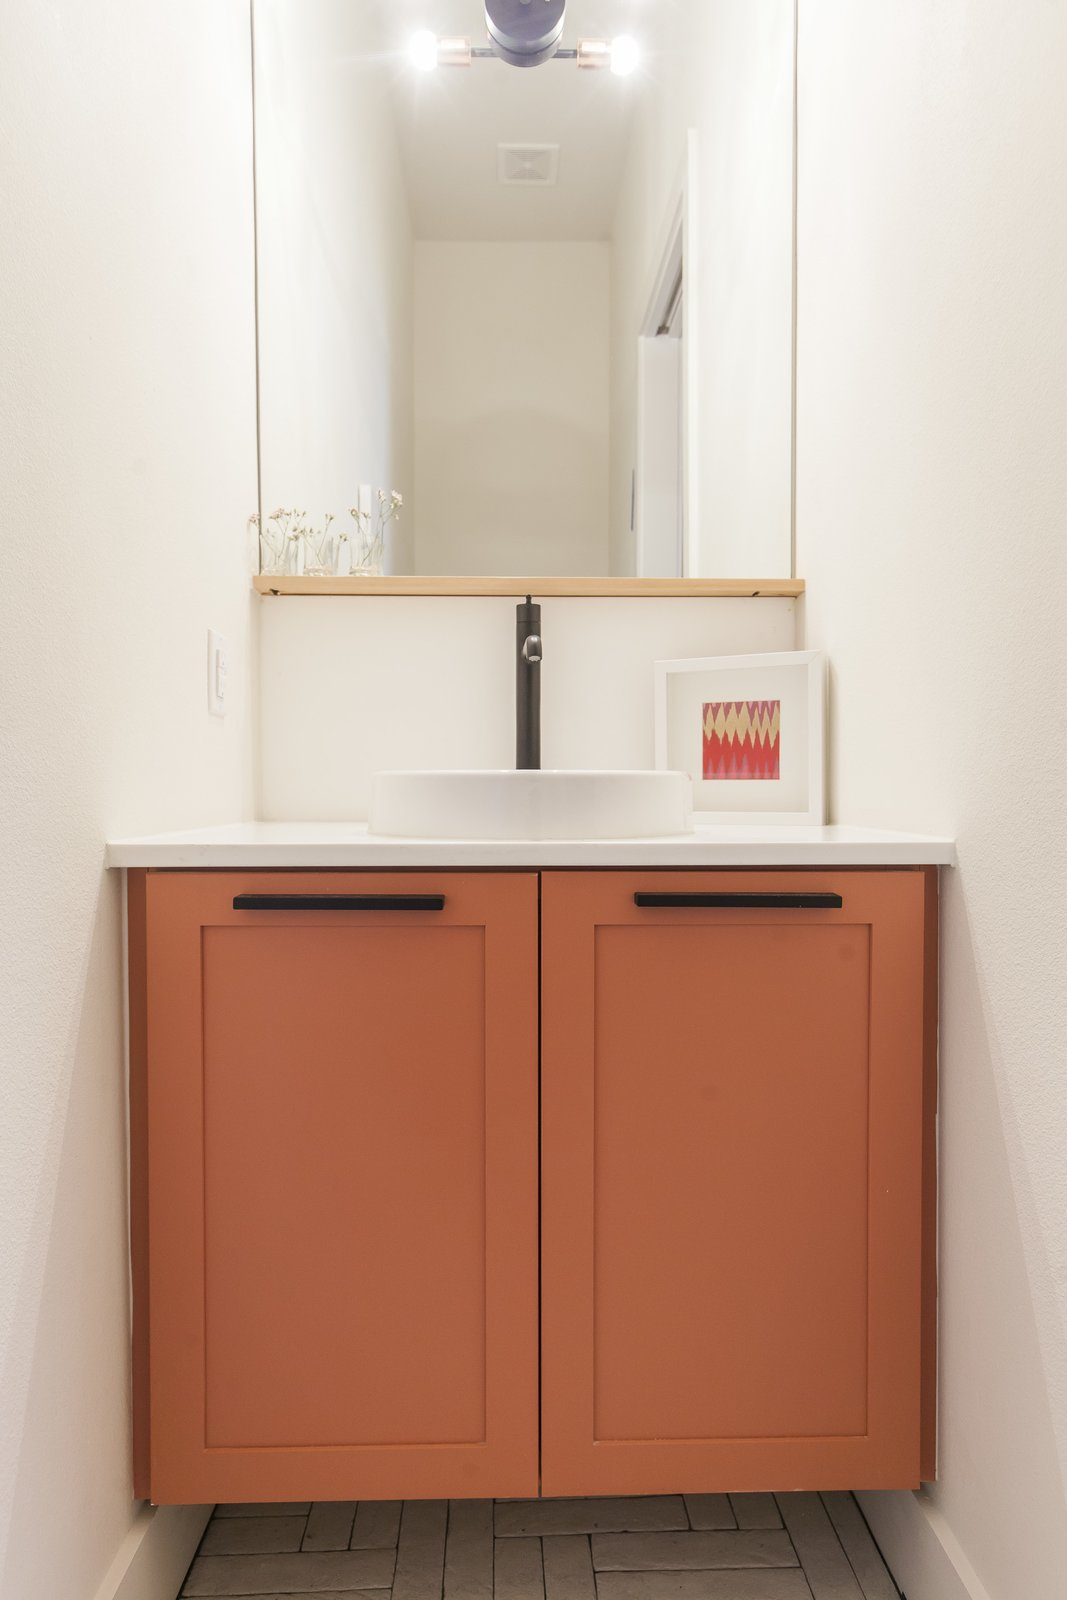 My favorite - Unit A powder room.  Simple and unique.